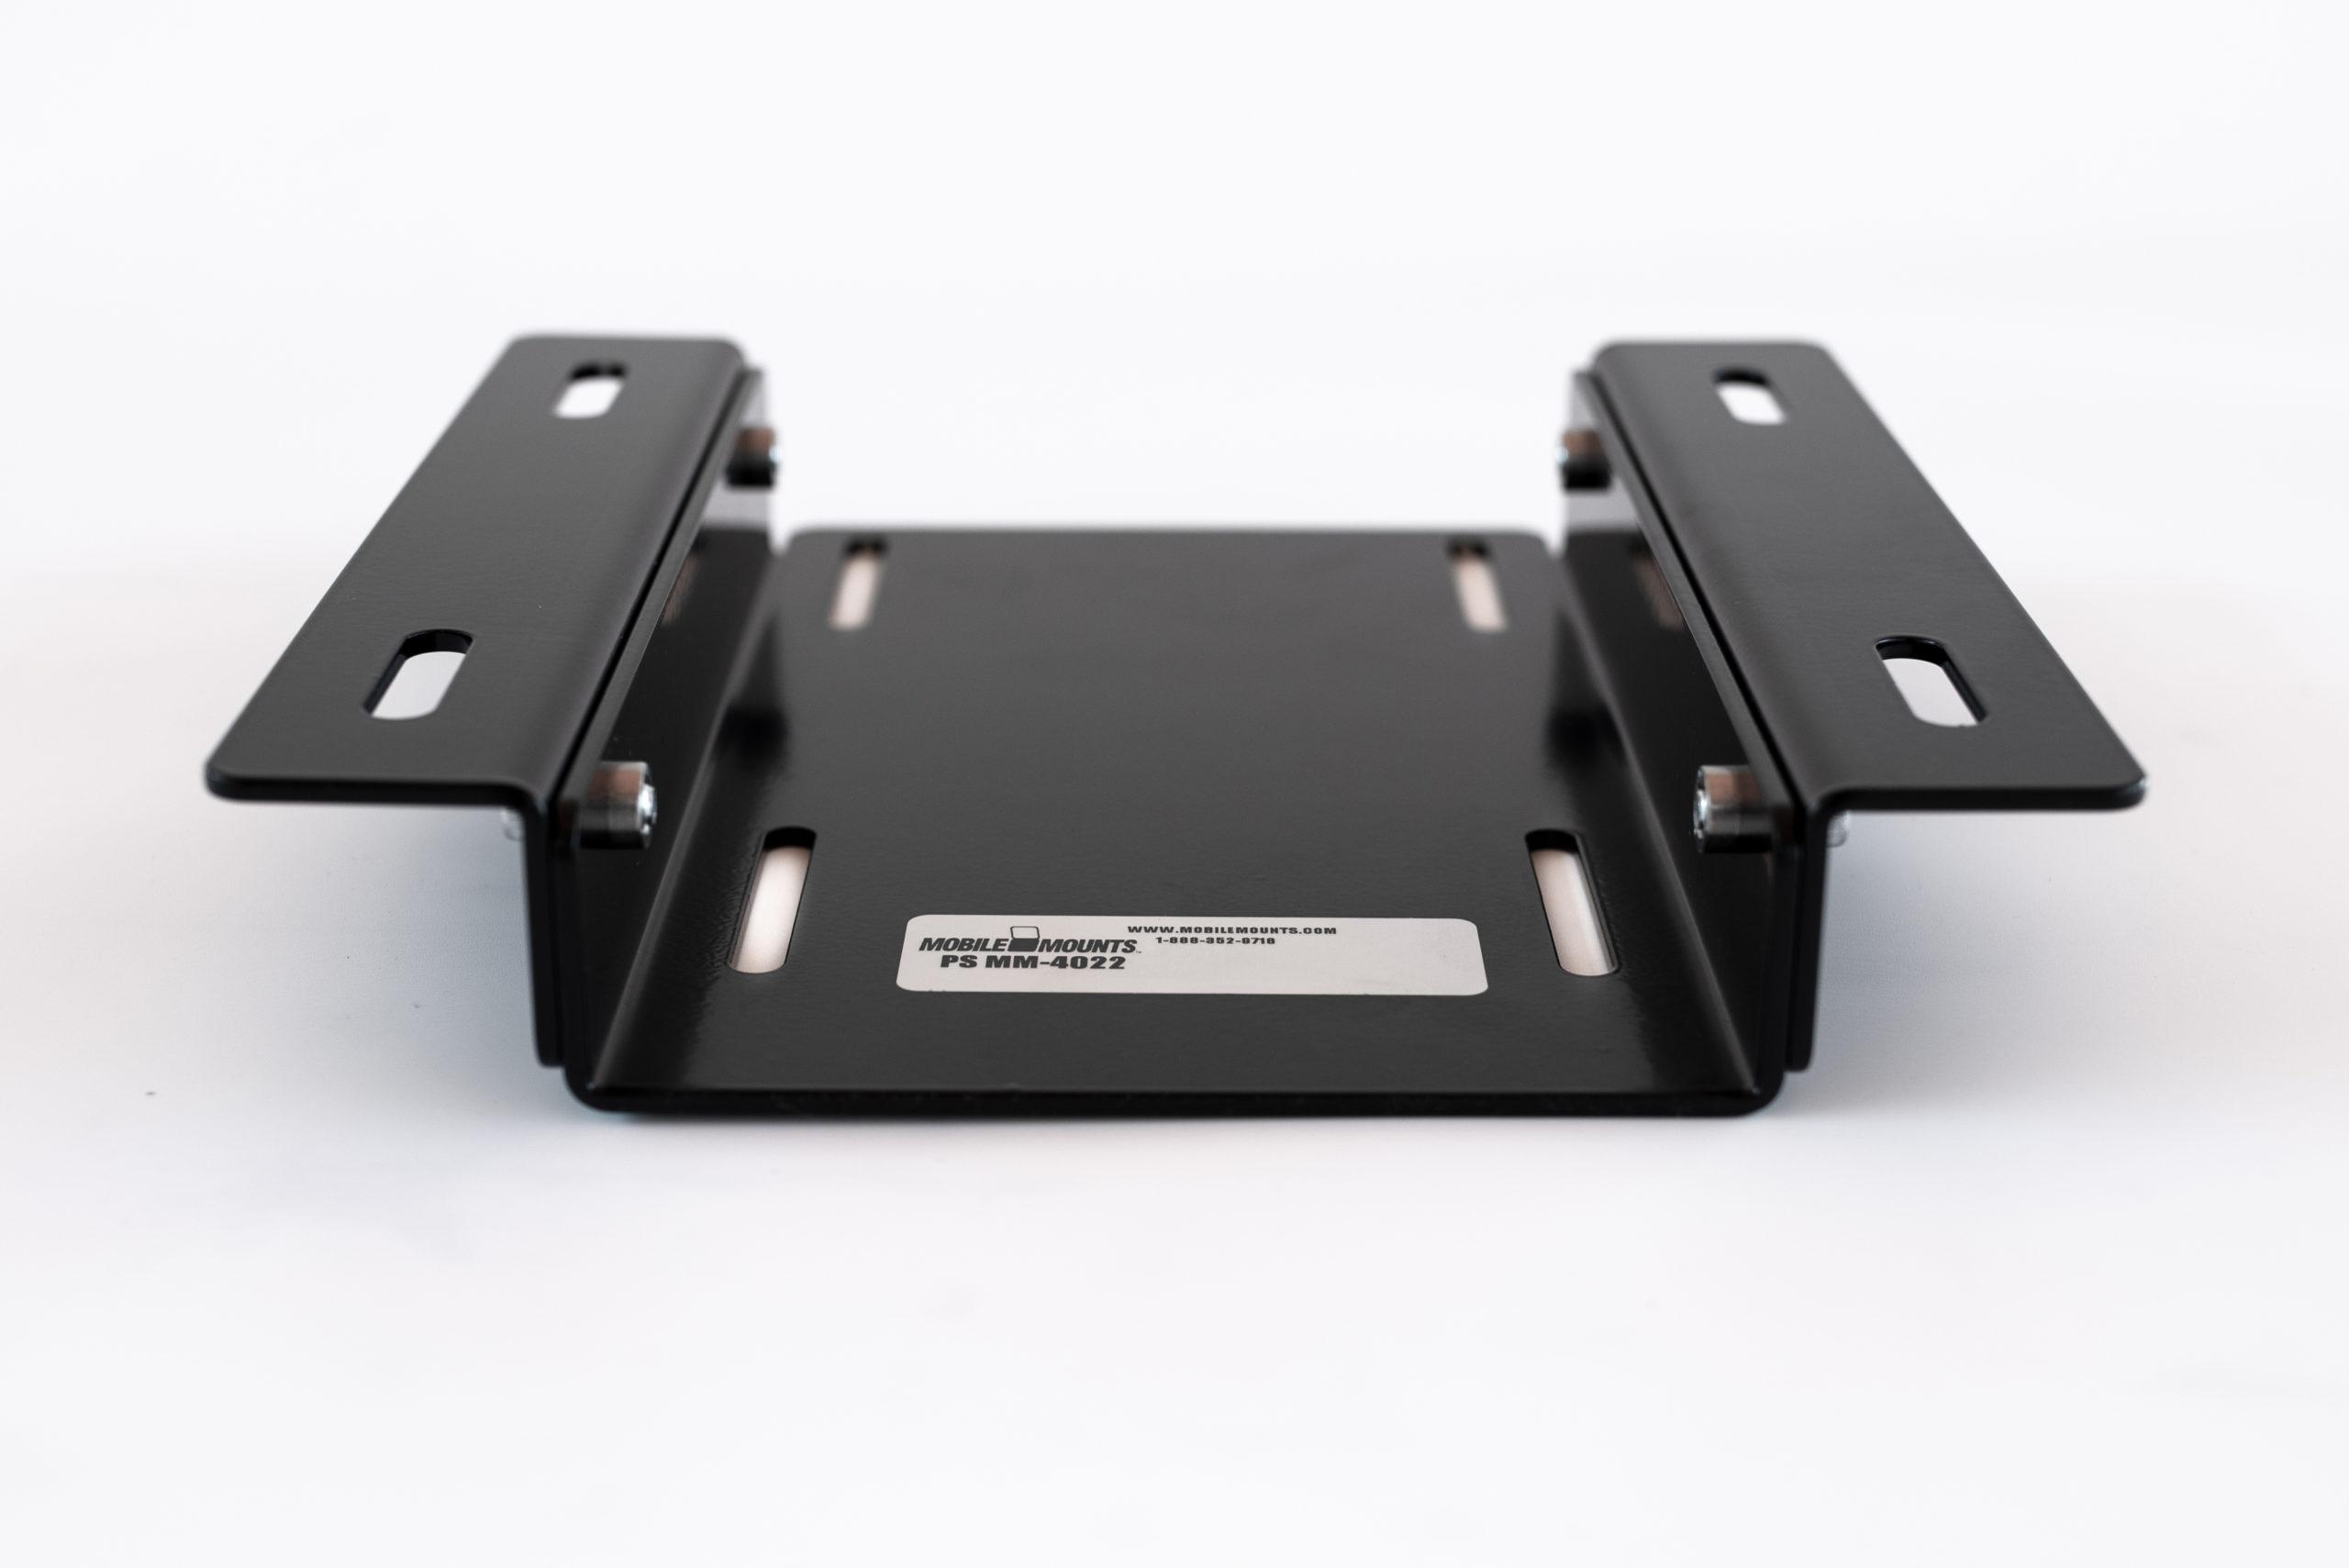 Mobile Mounts Armrest Riser for Consoles